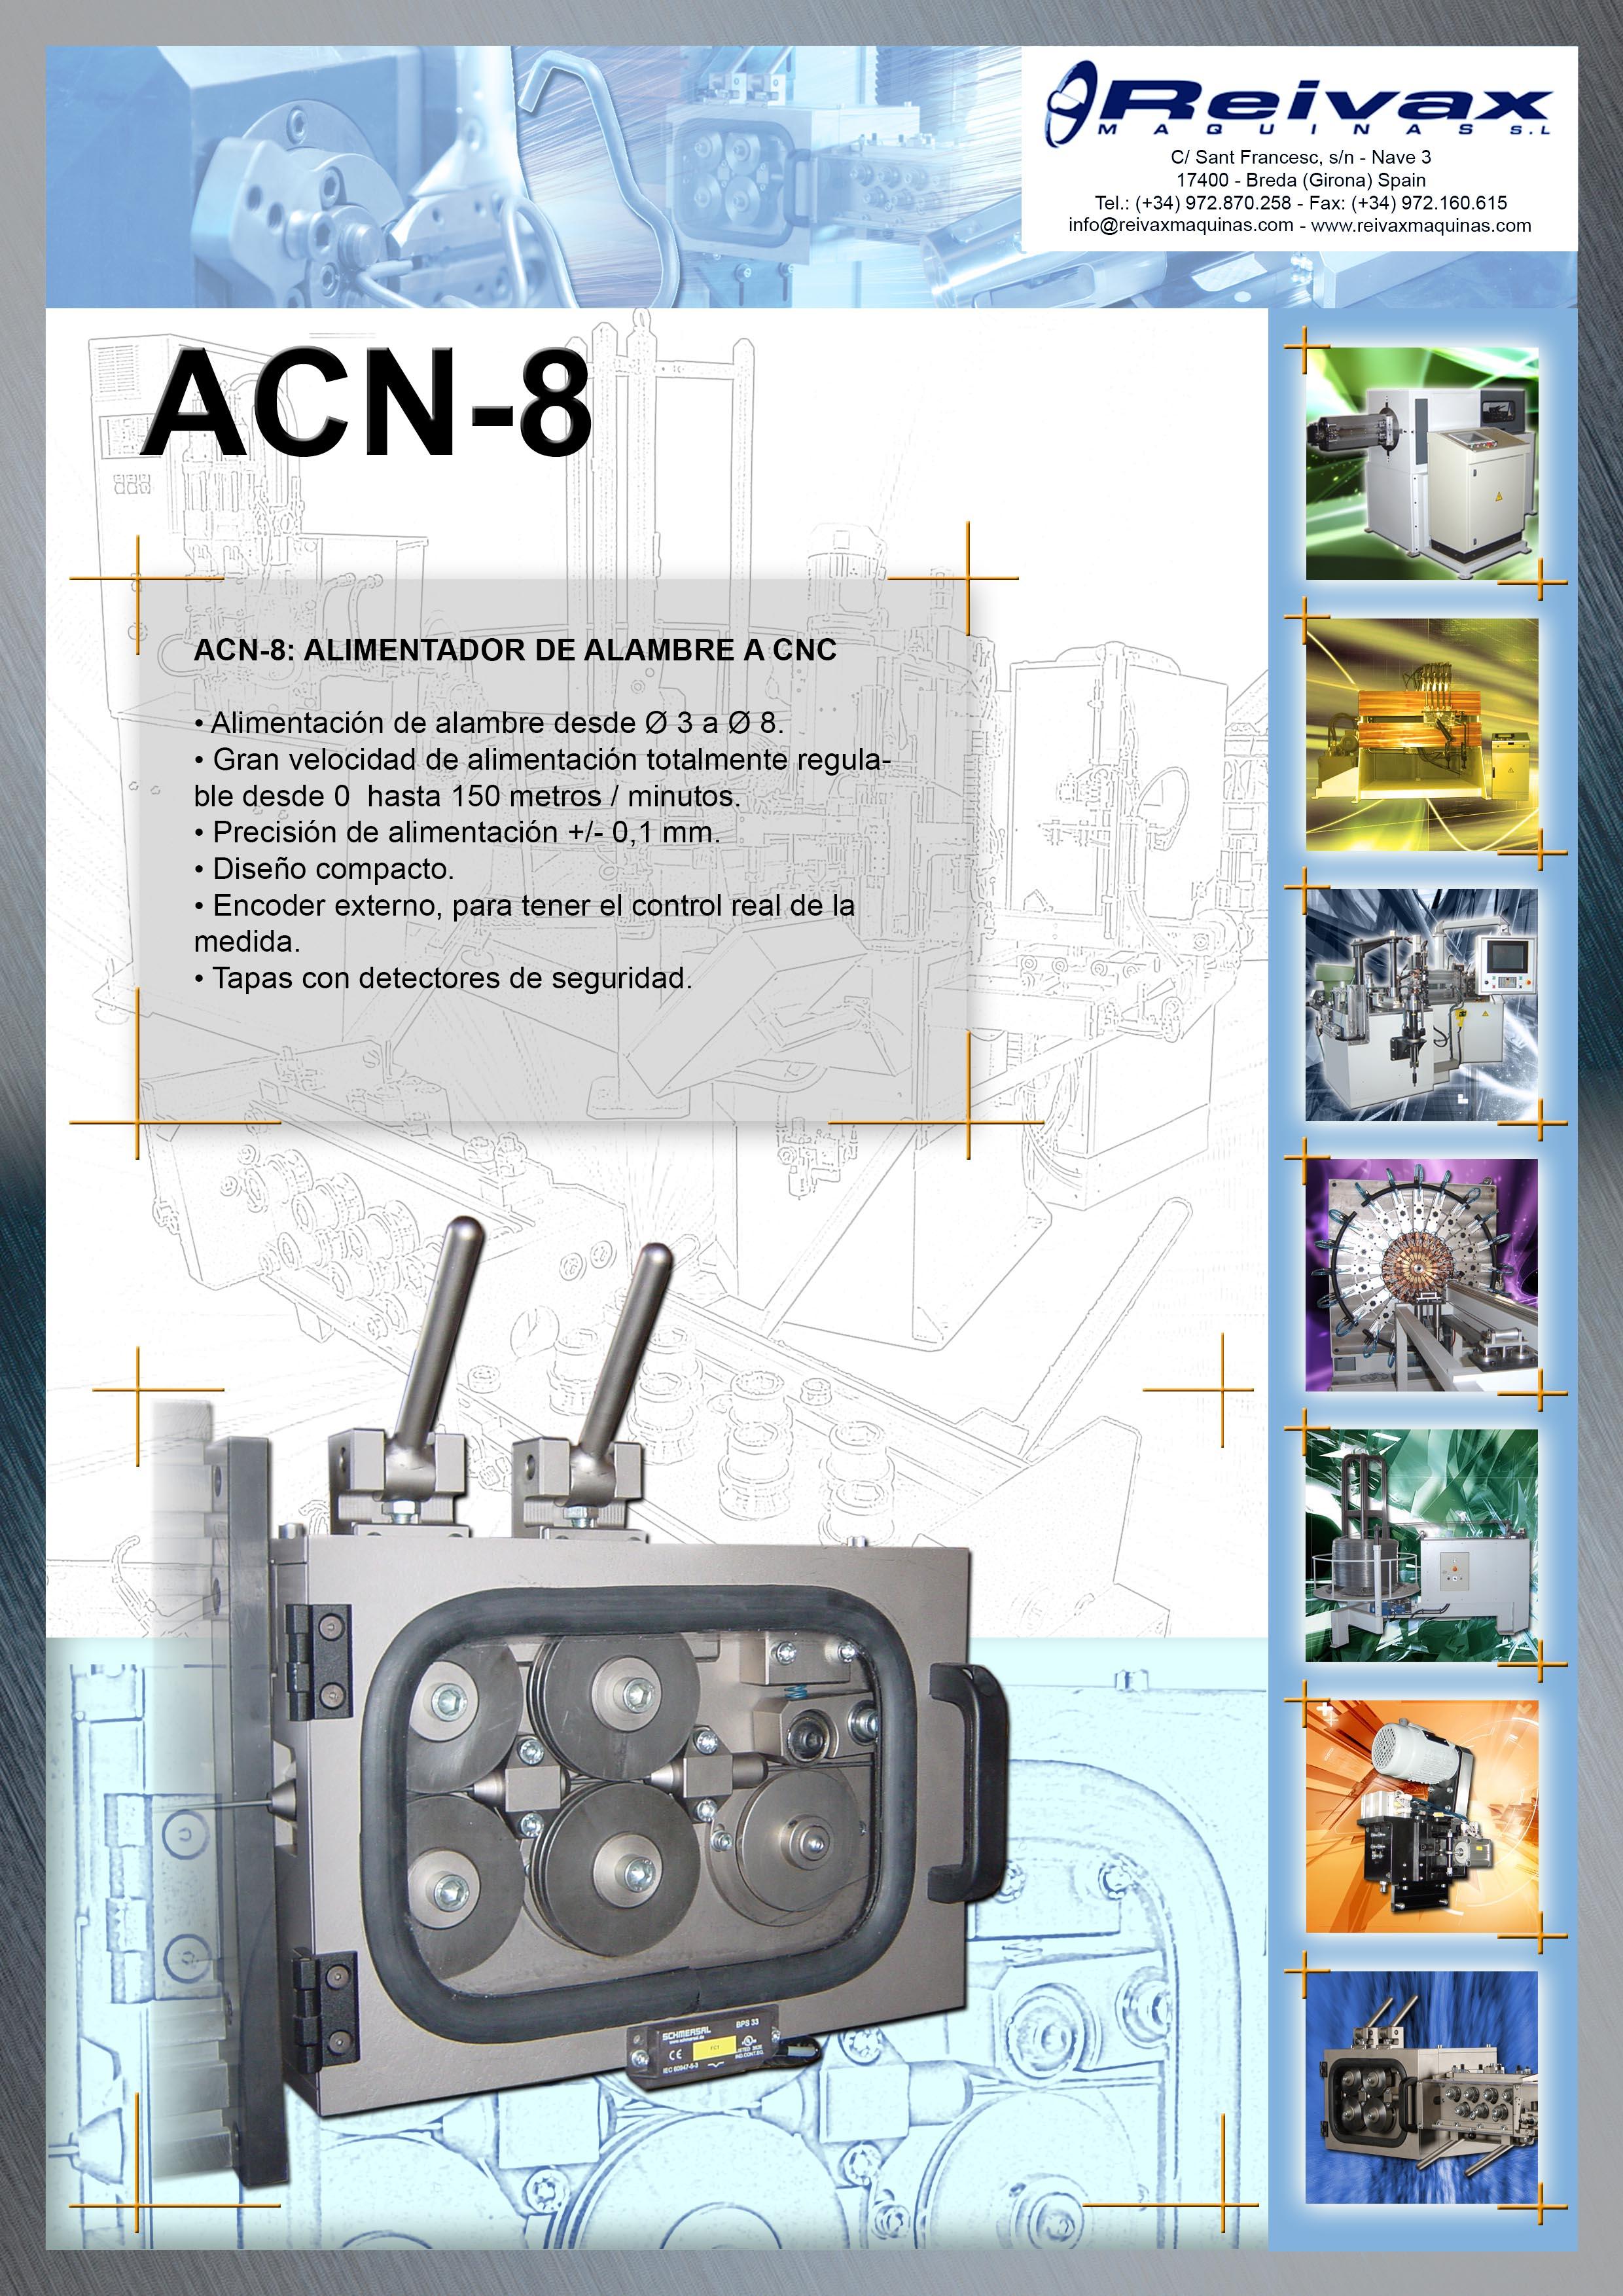 ReivaxMaquinas: Ficha Tecnica ACN-8